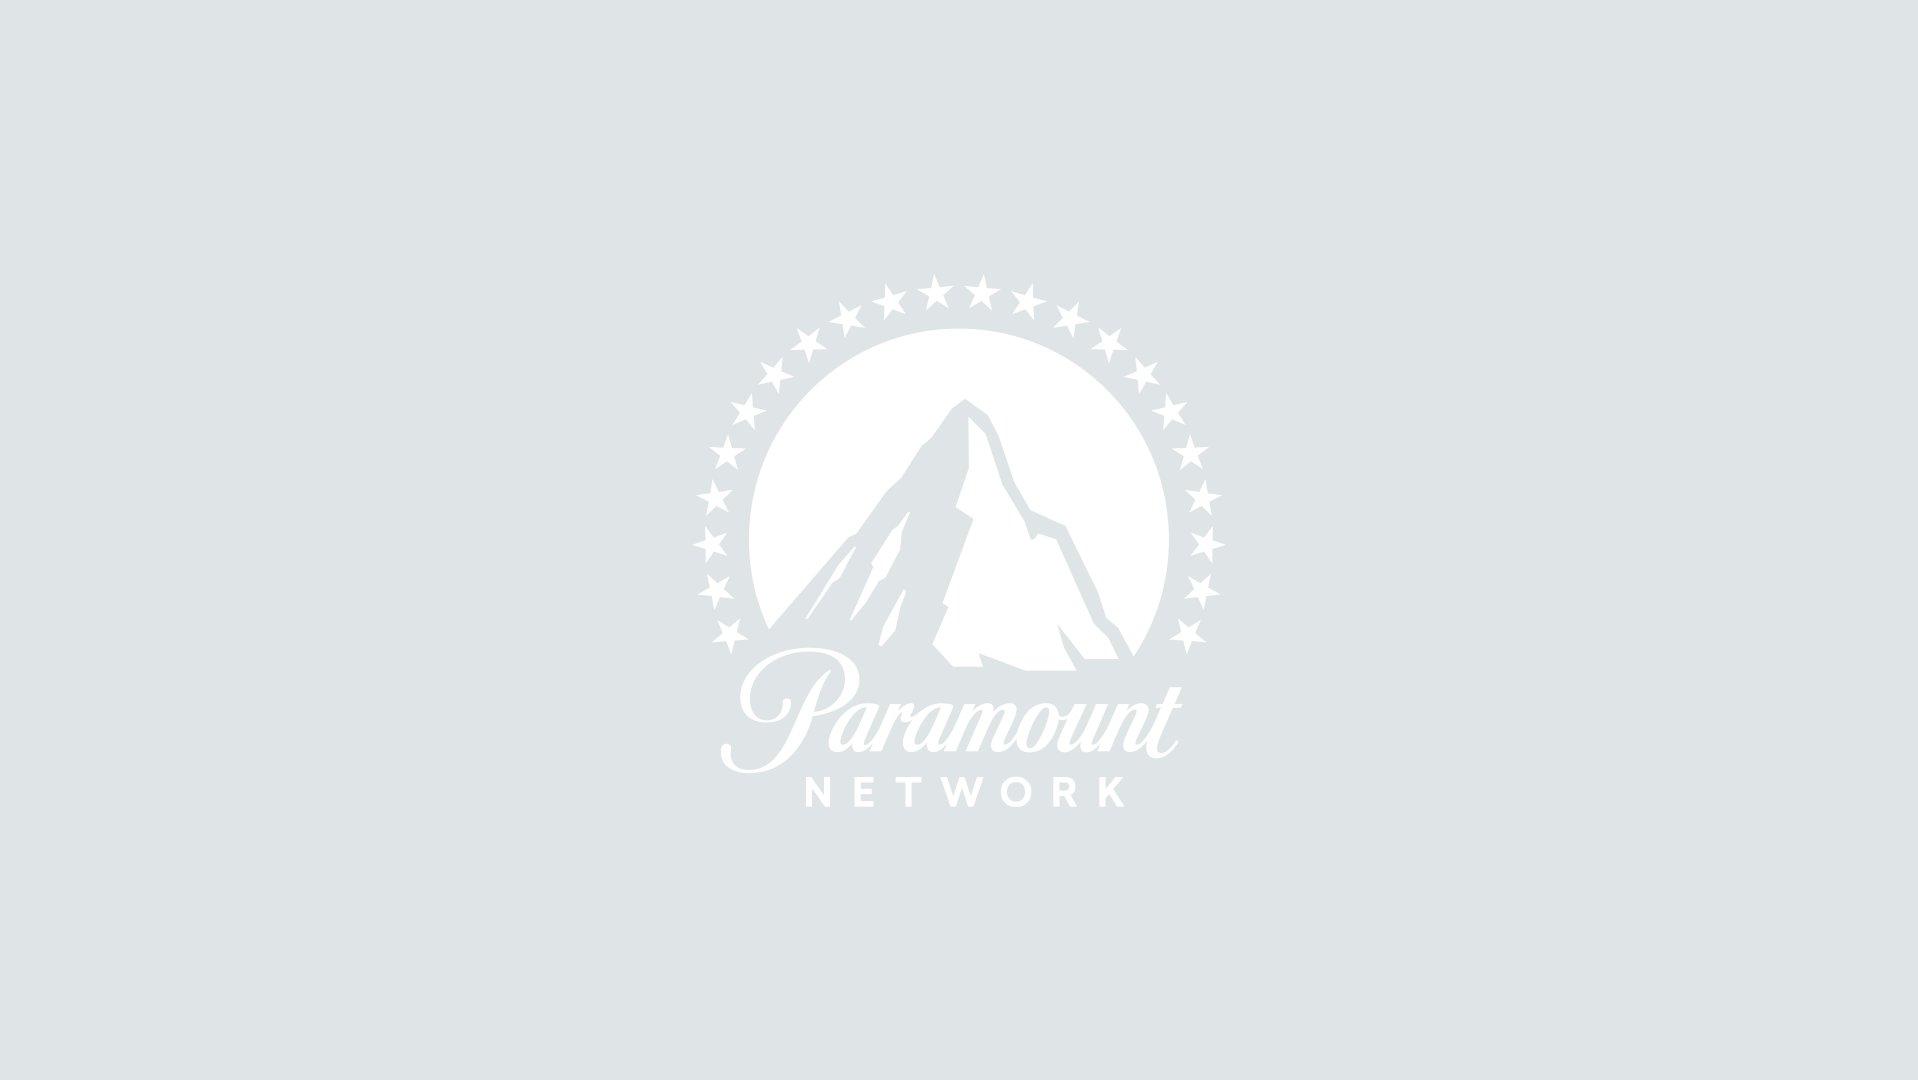 Hugh Grant e Julia Roberts (Notting Hill), foto: Getty Images